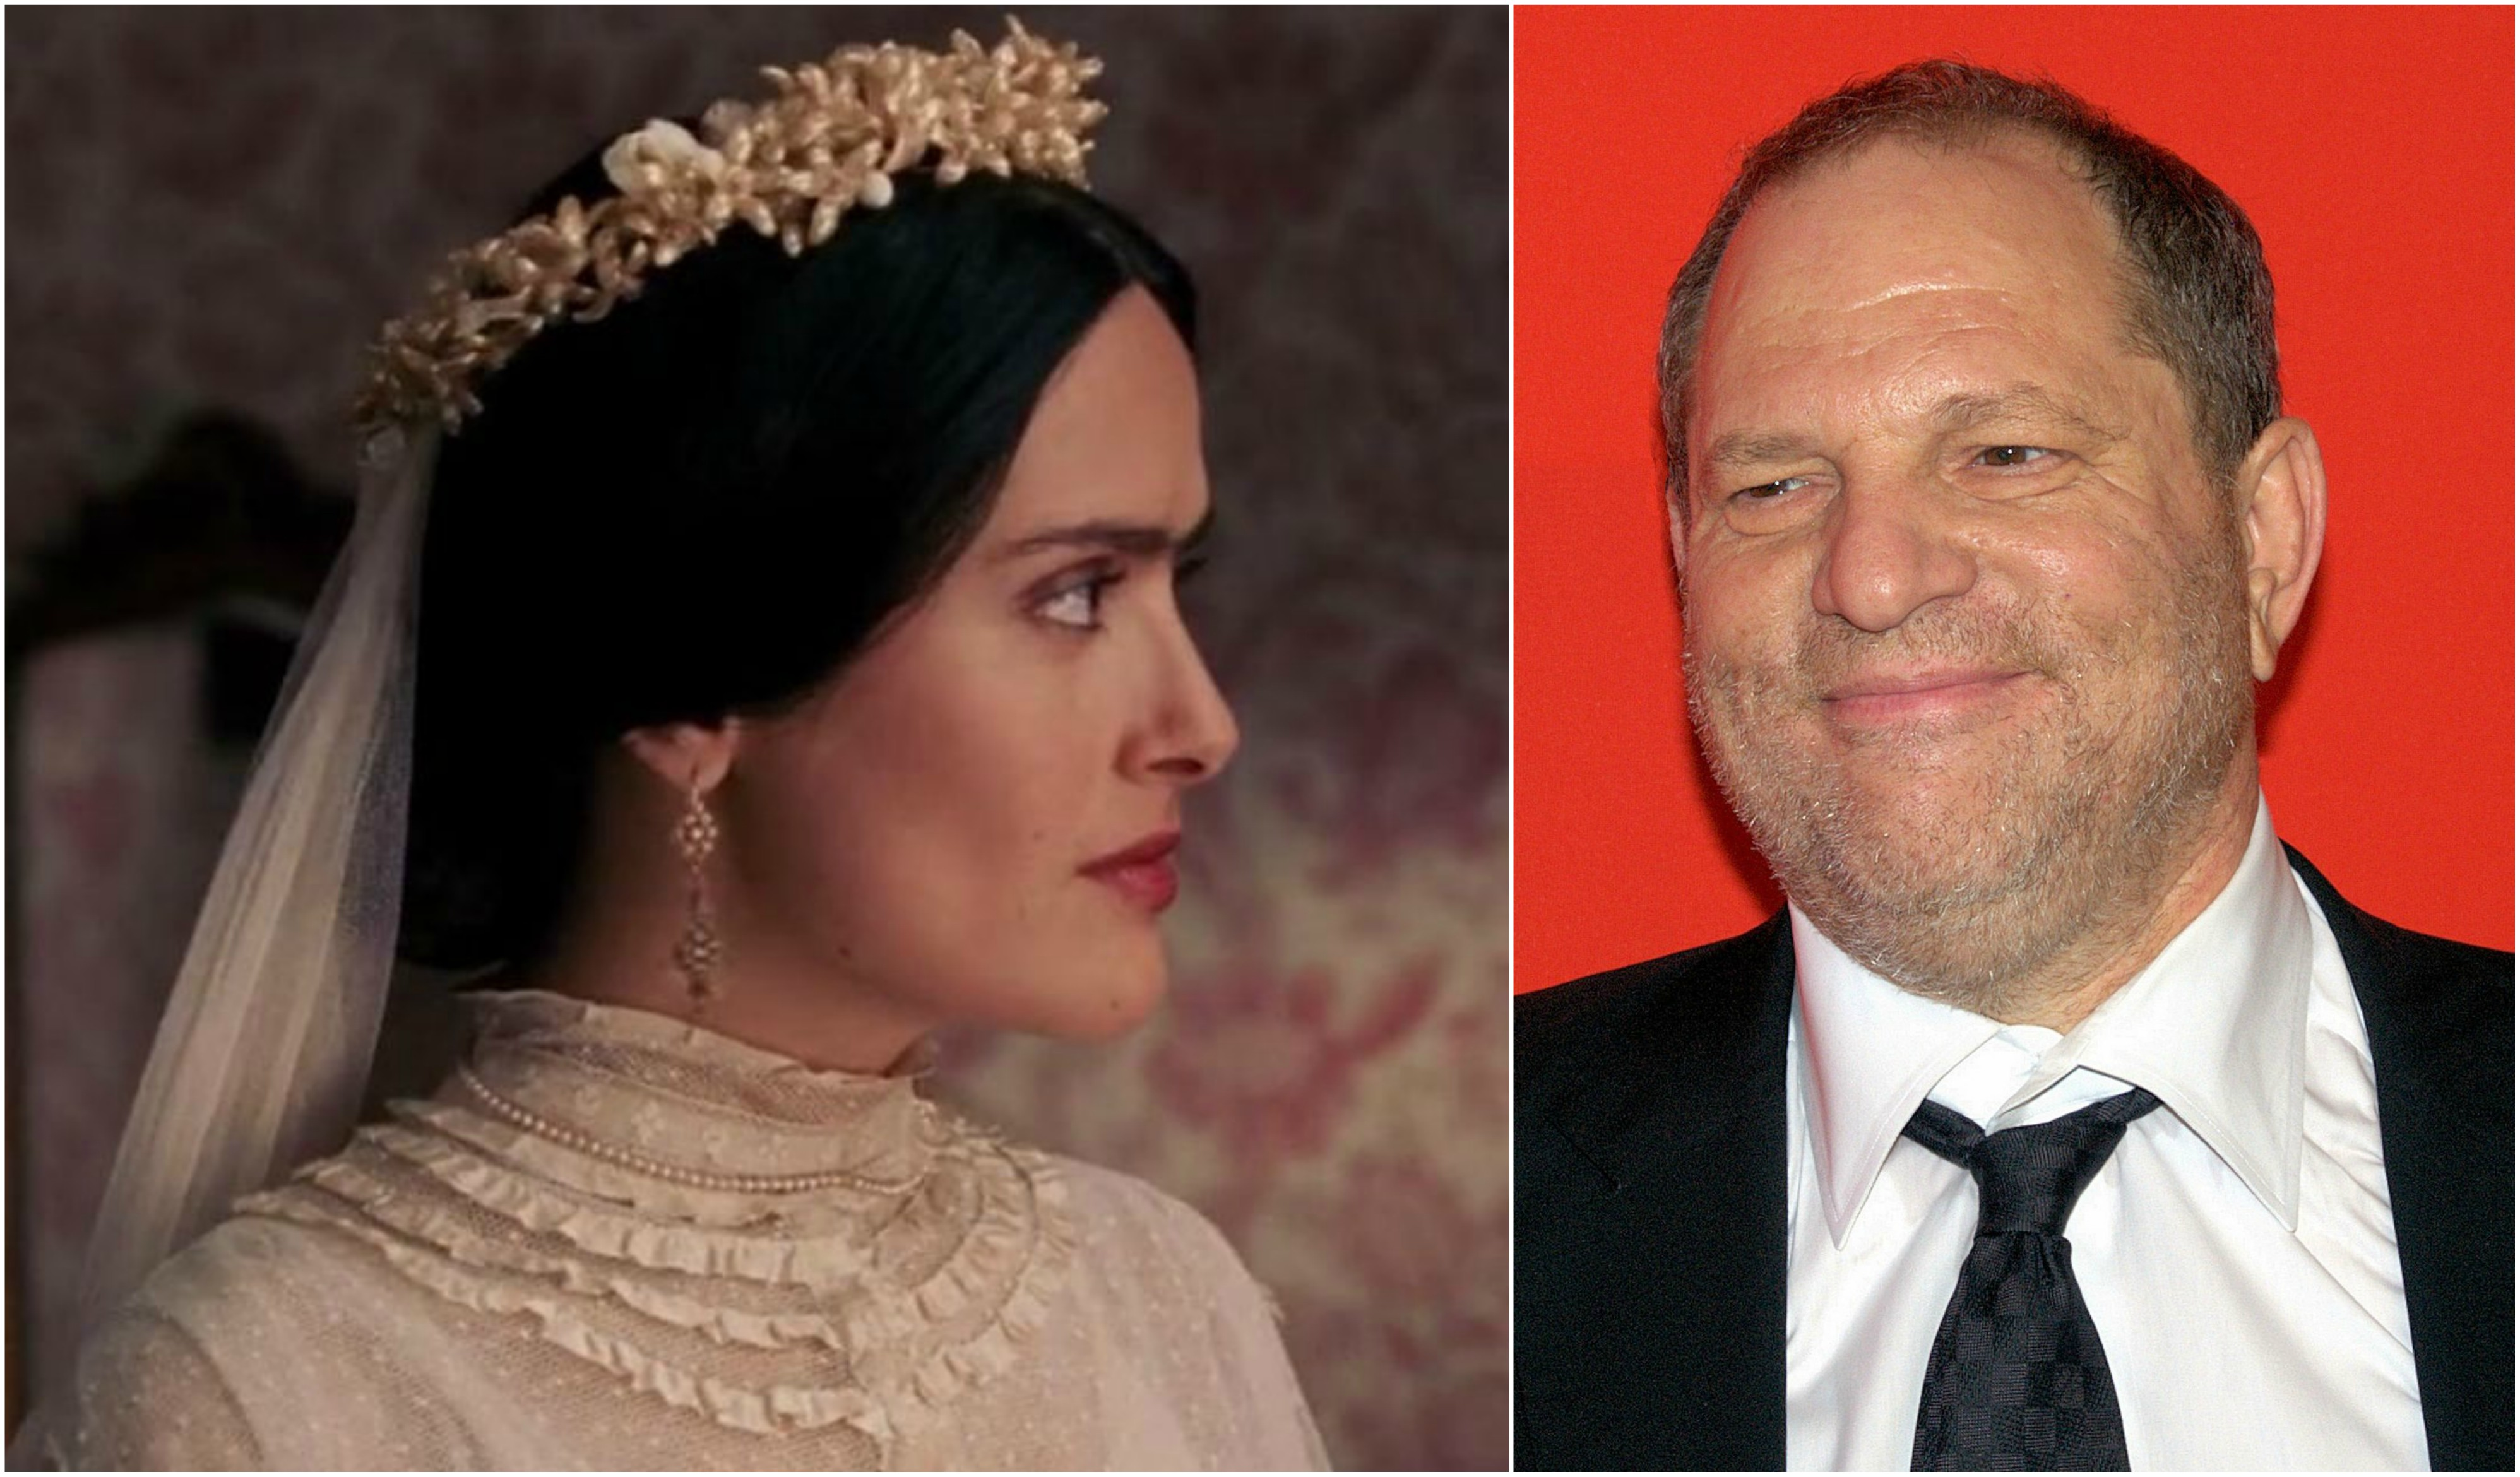 Salma Hayek levanta novas acusações contra Harvey Weinstein